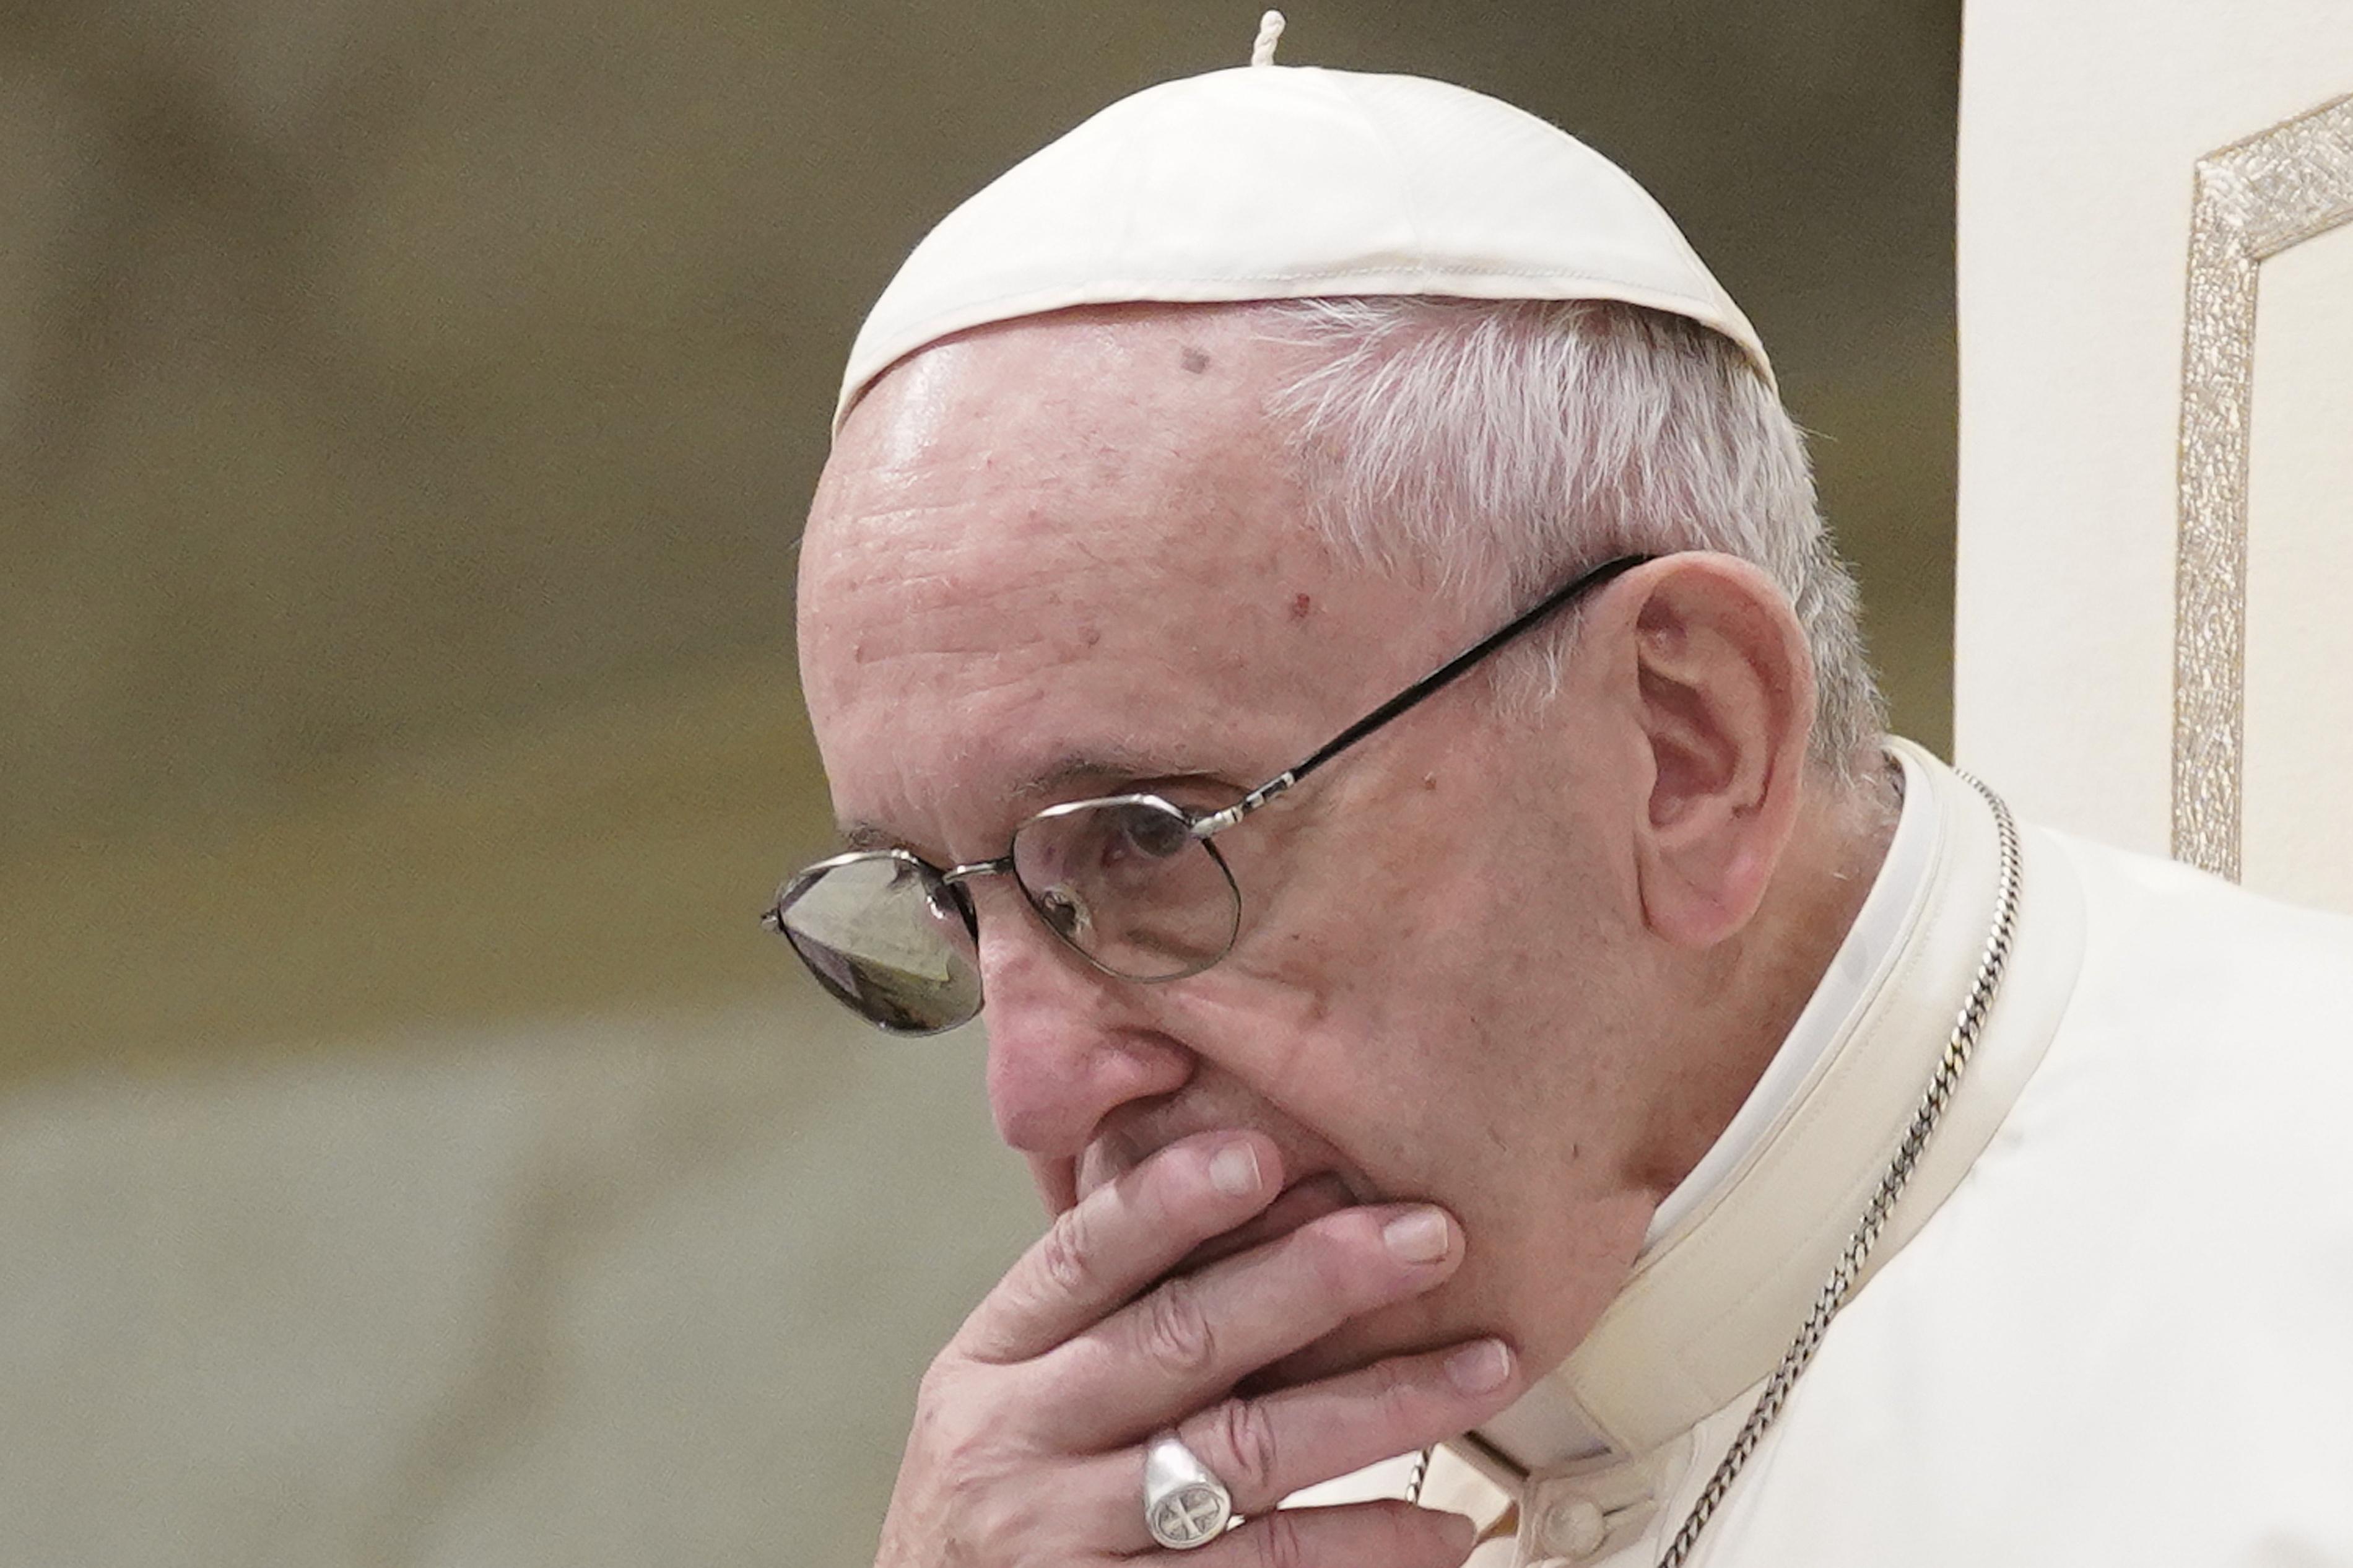 Penitent priest pederast